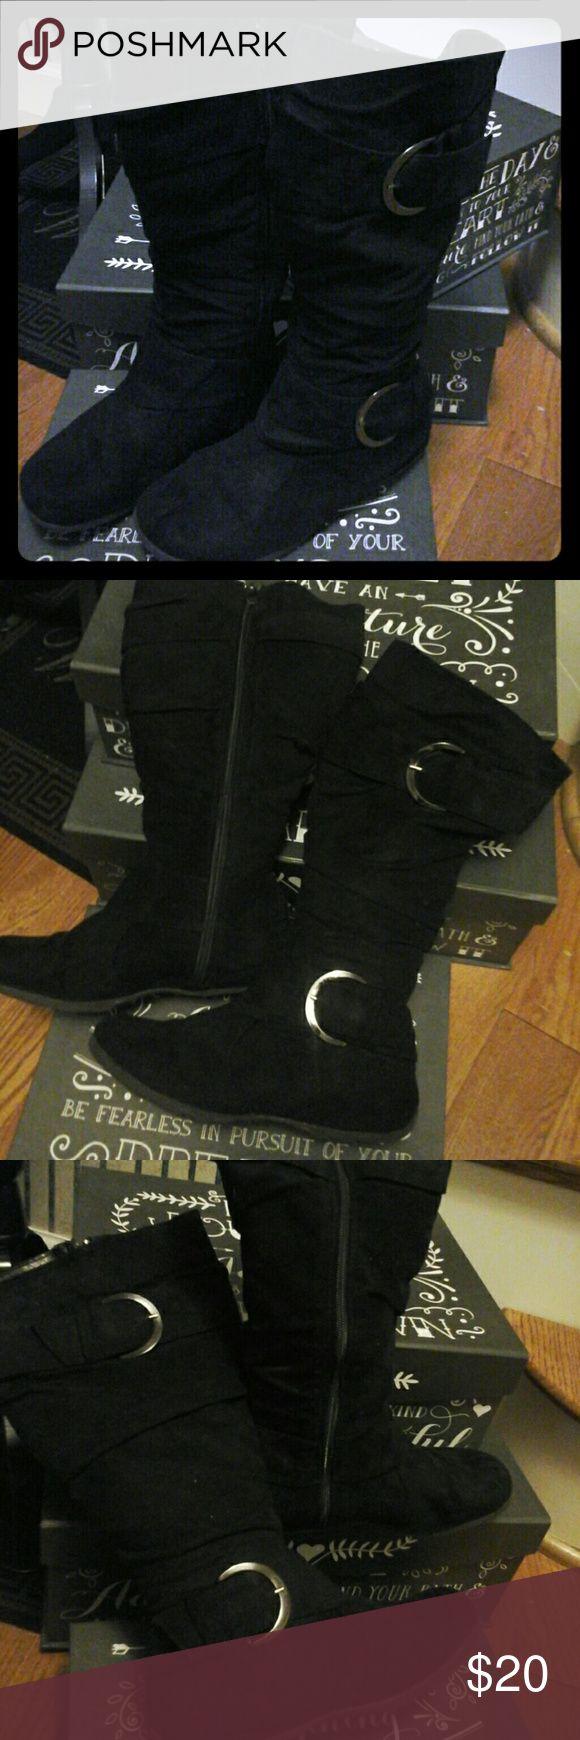 Donald pliner otk boots - 1 4